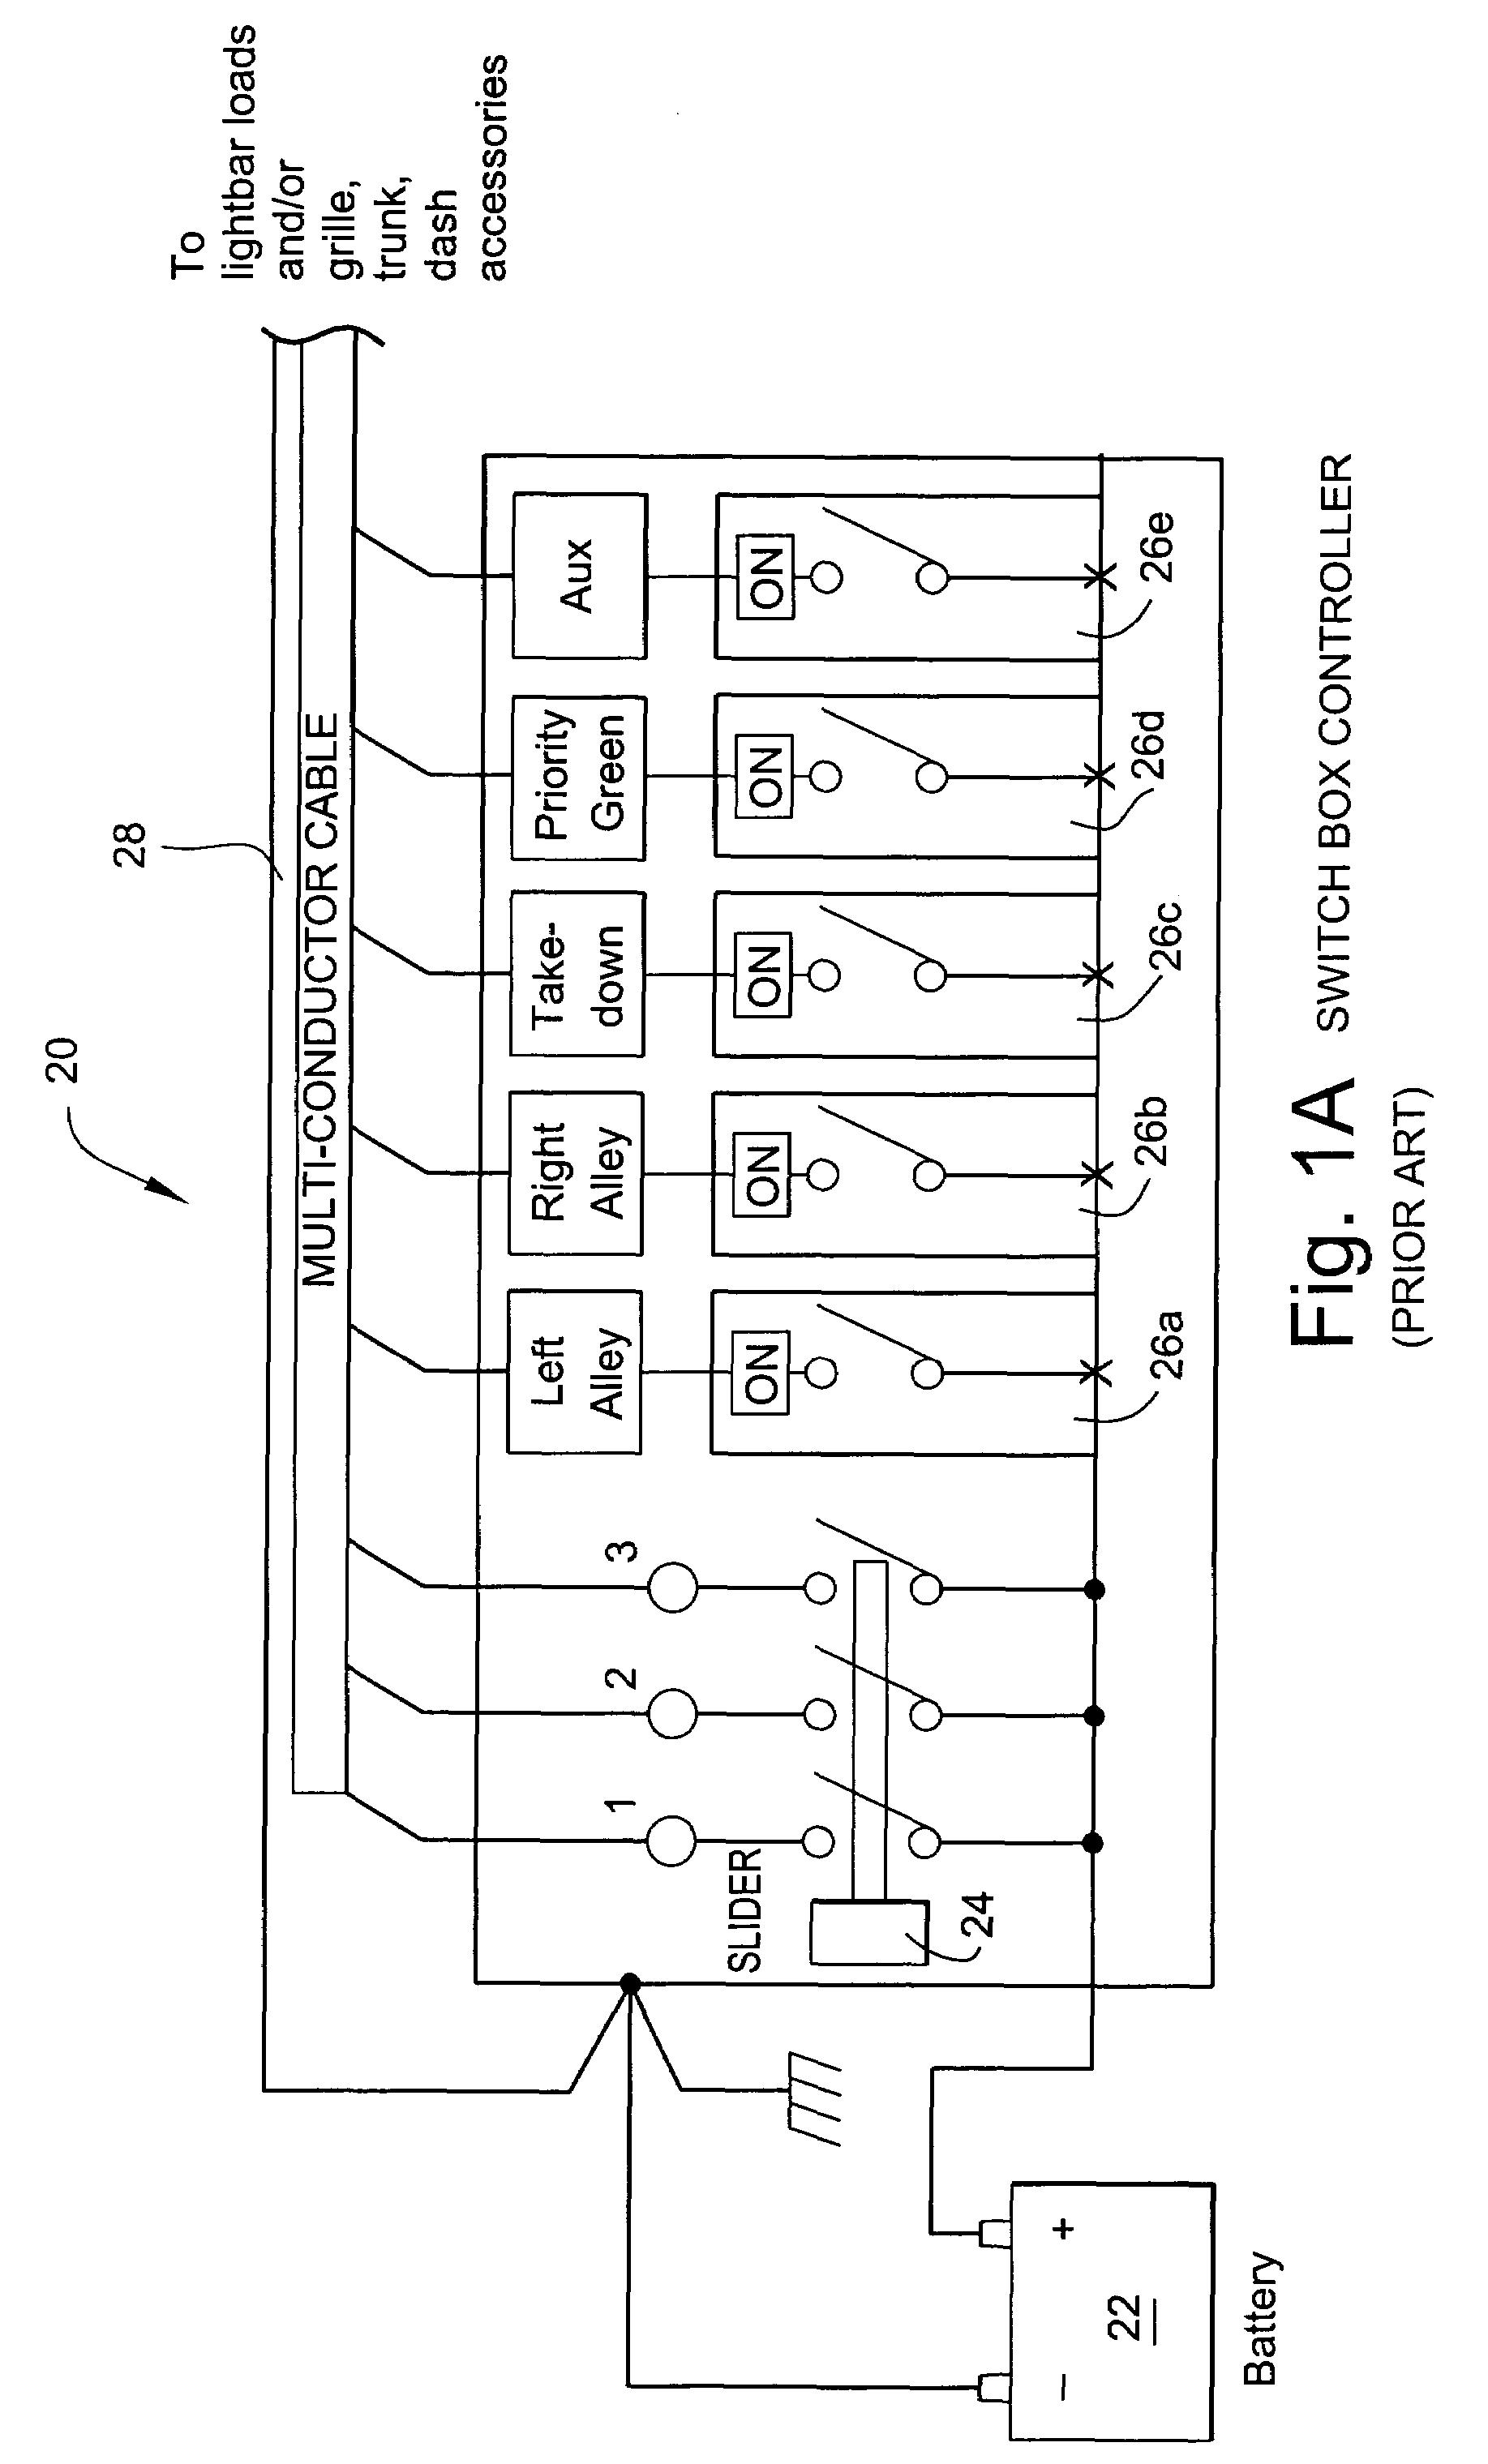 Light Ballast Wiring Diagram Moreover Emergency Light Wiring